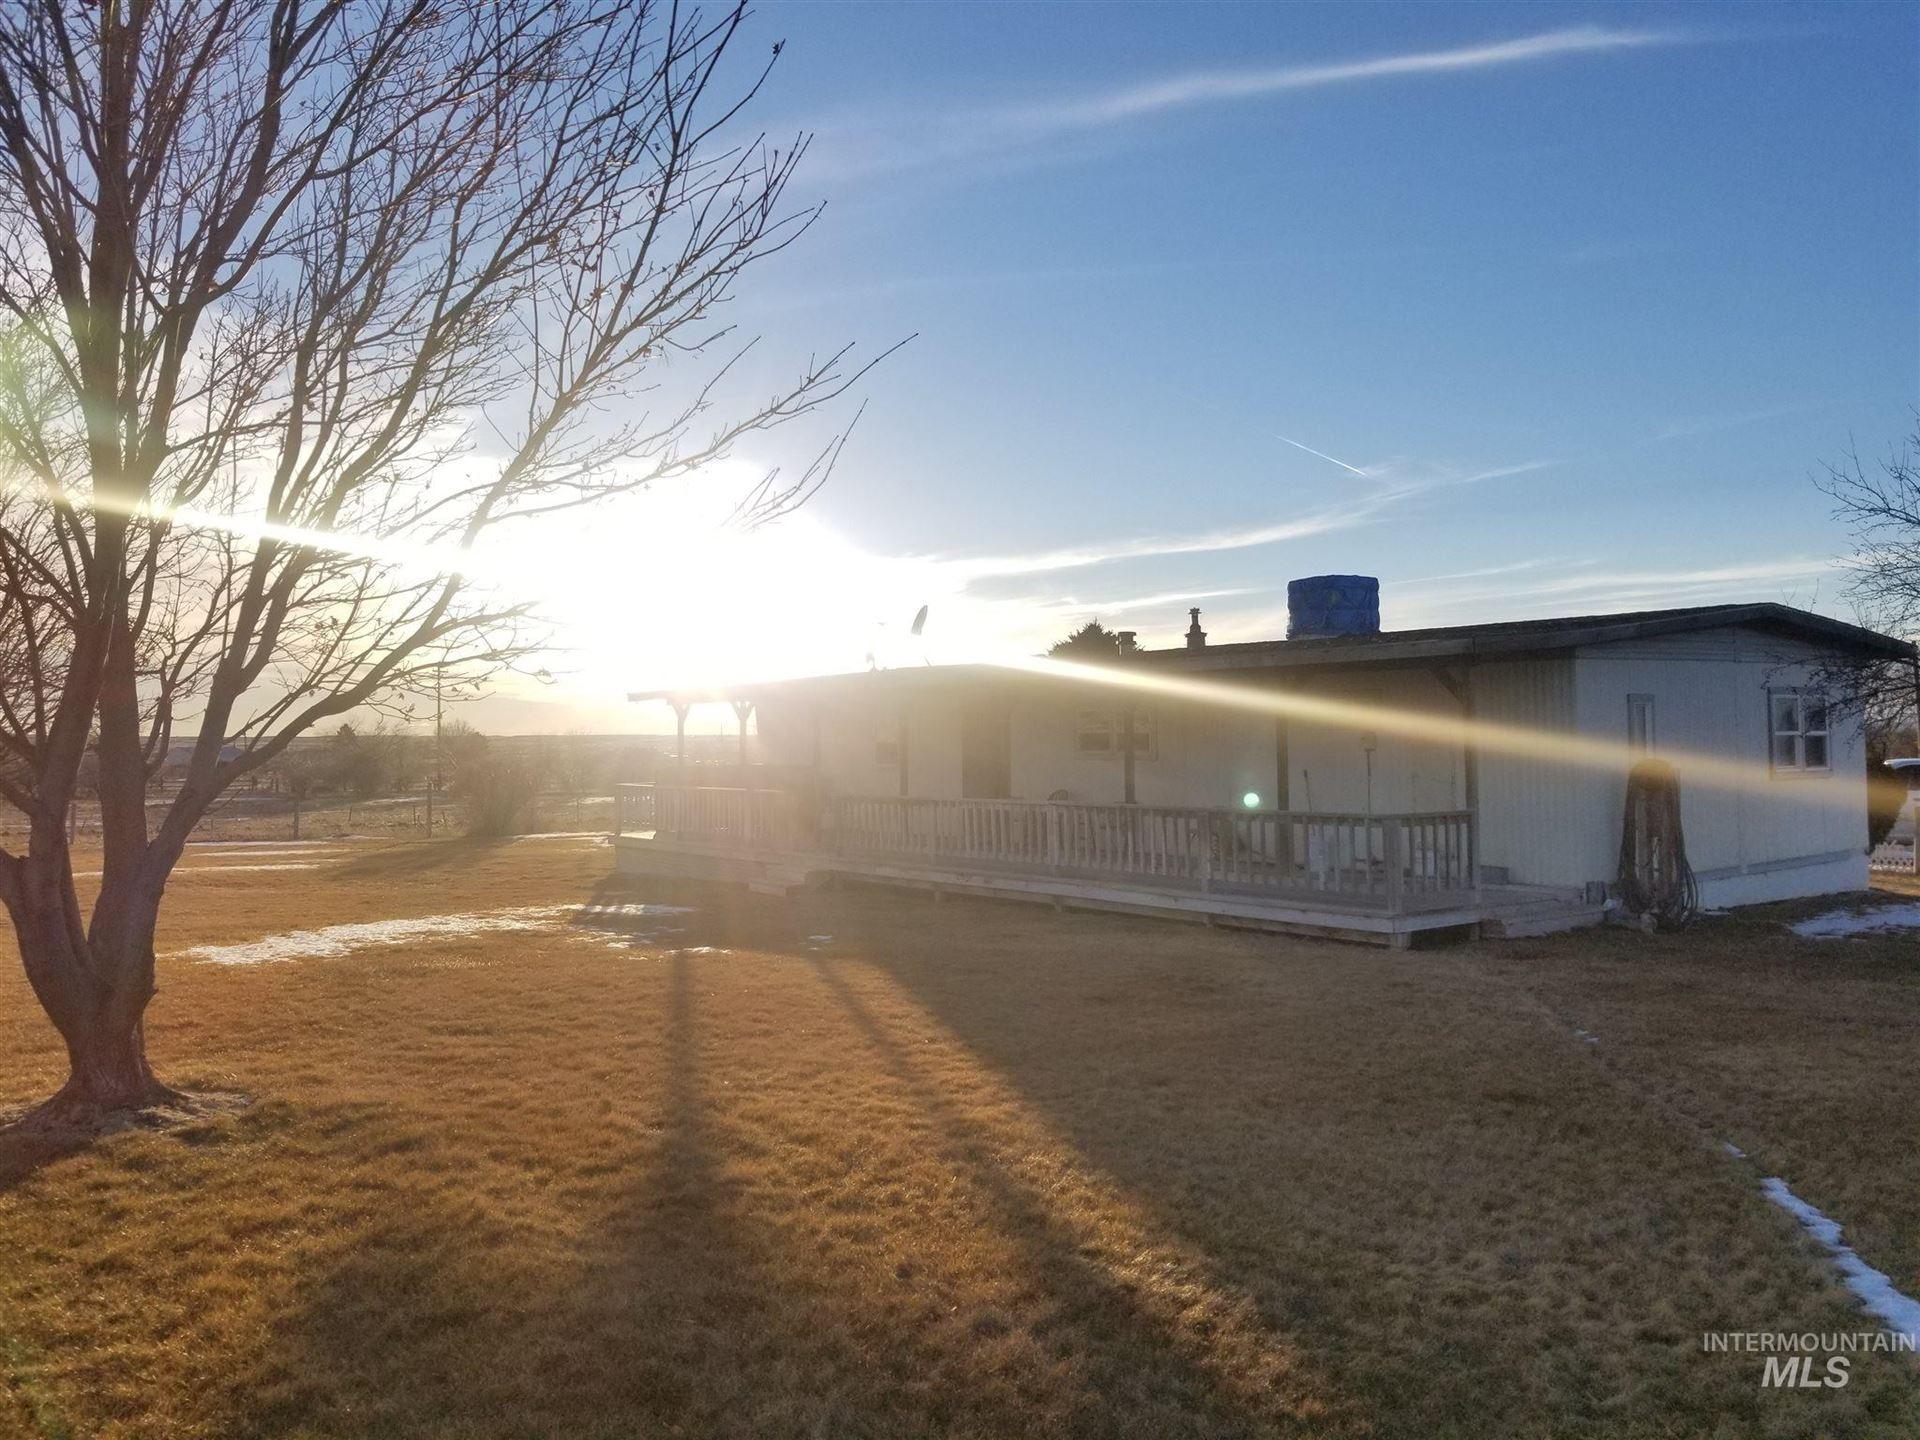 Photo of 34 S 200 East, Shoshone, ID 83352-9999 (MLS # 98794286)